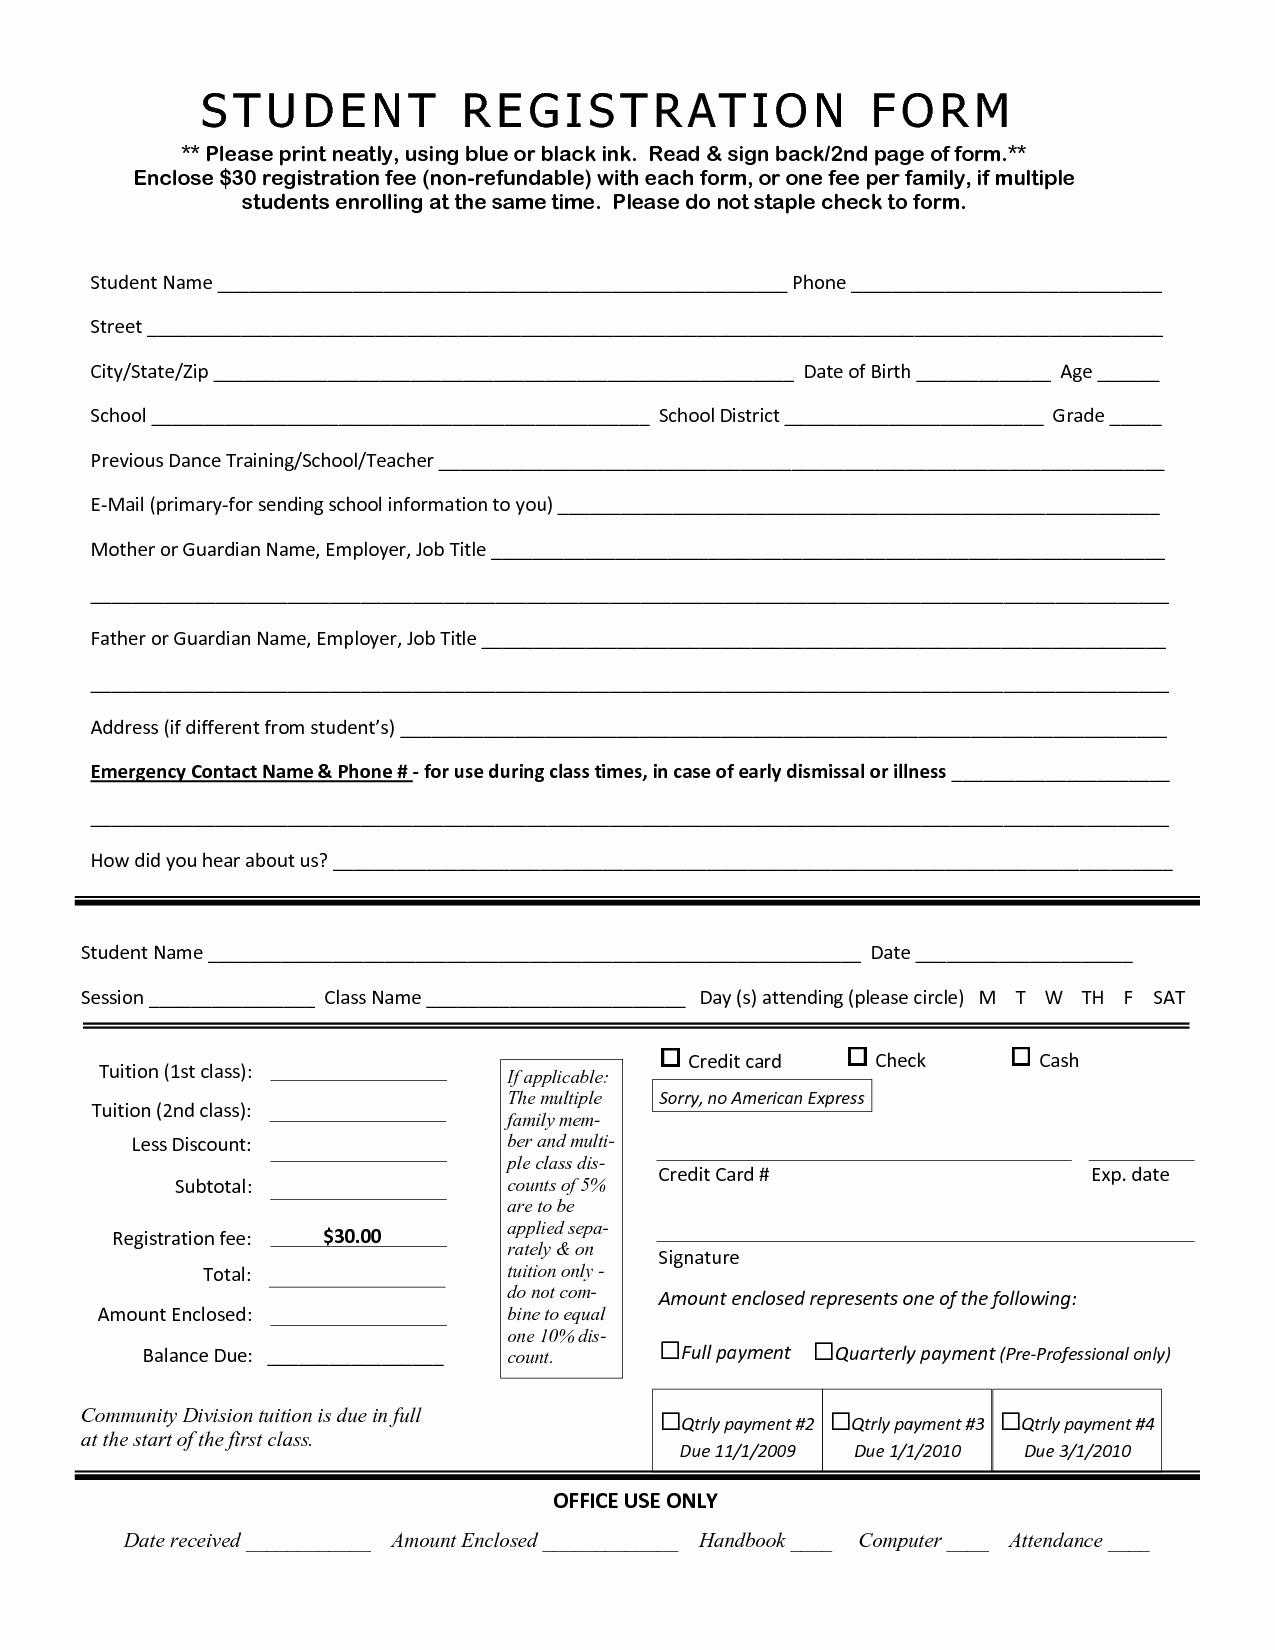 Student Application form Template Portablegasgrillweber